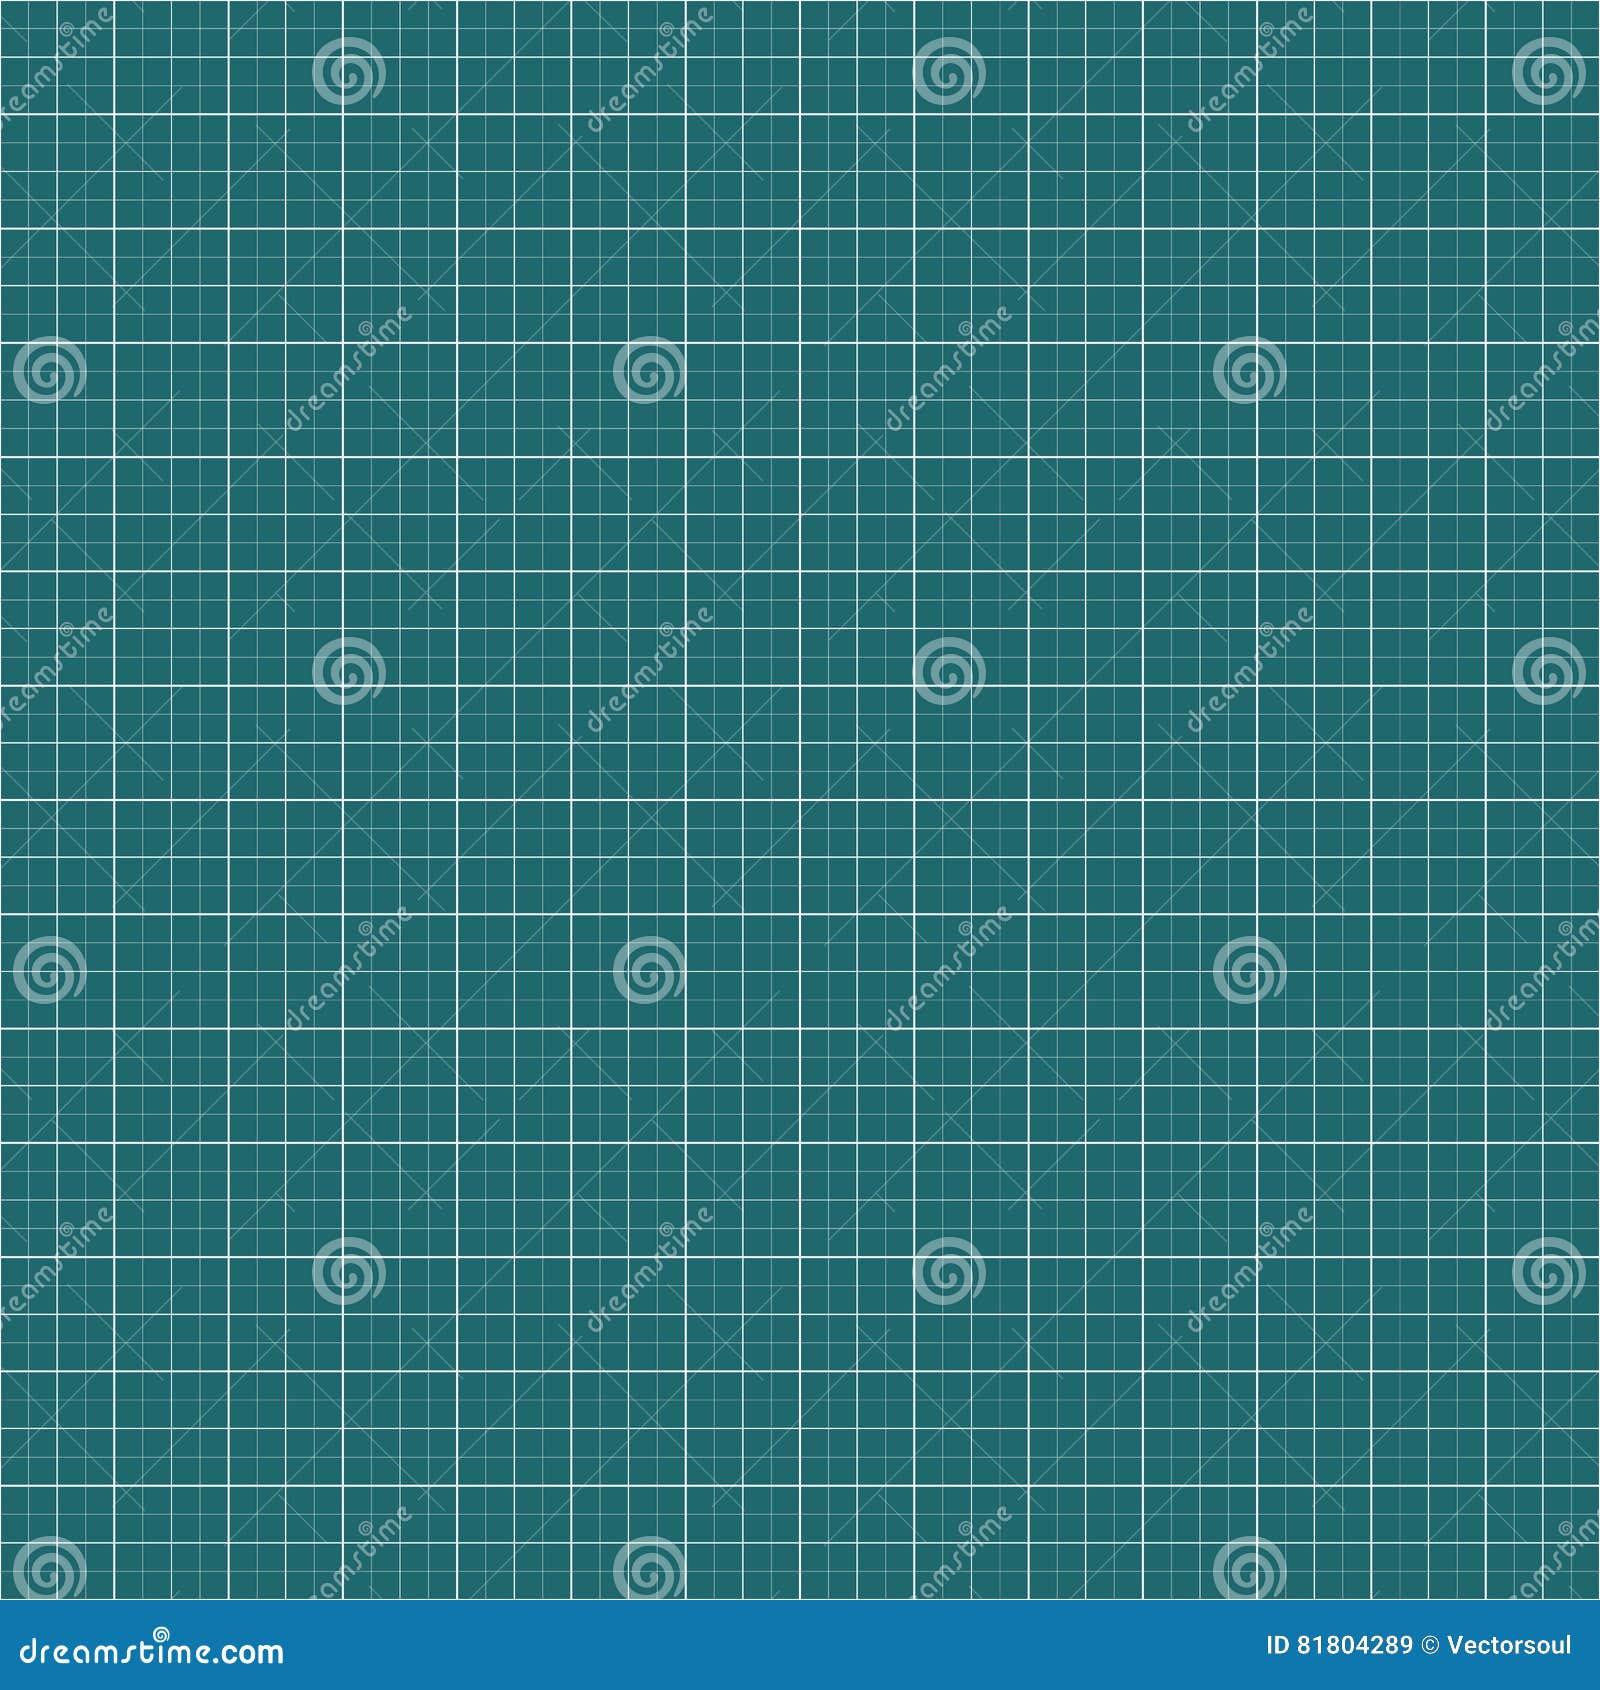 Диаграмма, предпосылка миллиметра бумажная Пустая решетка, предпосылка сетки